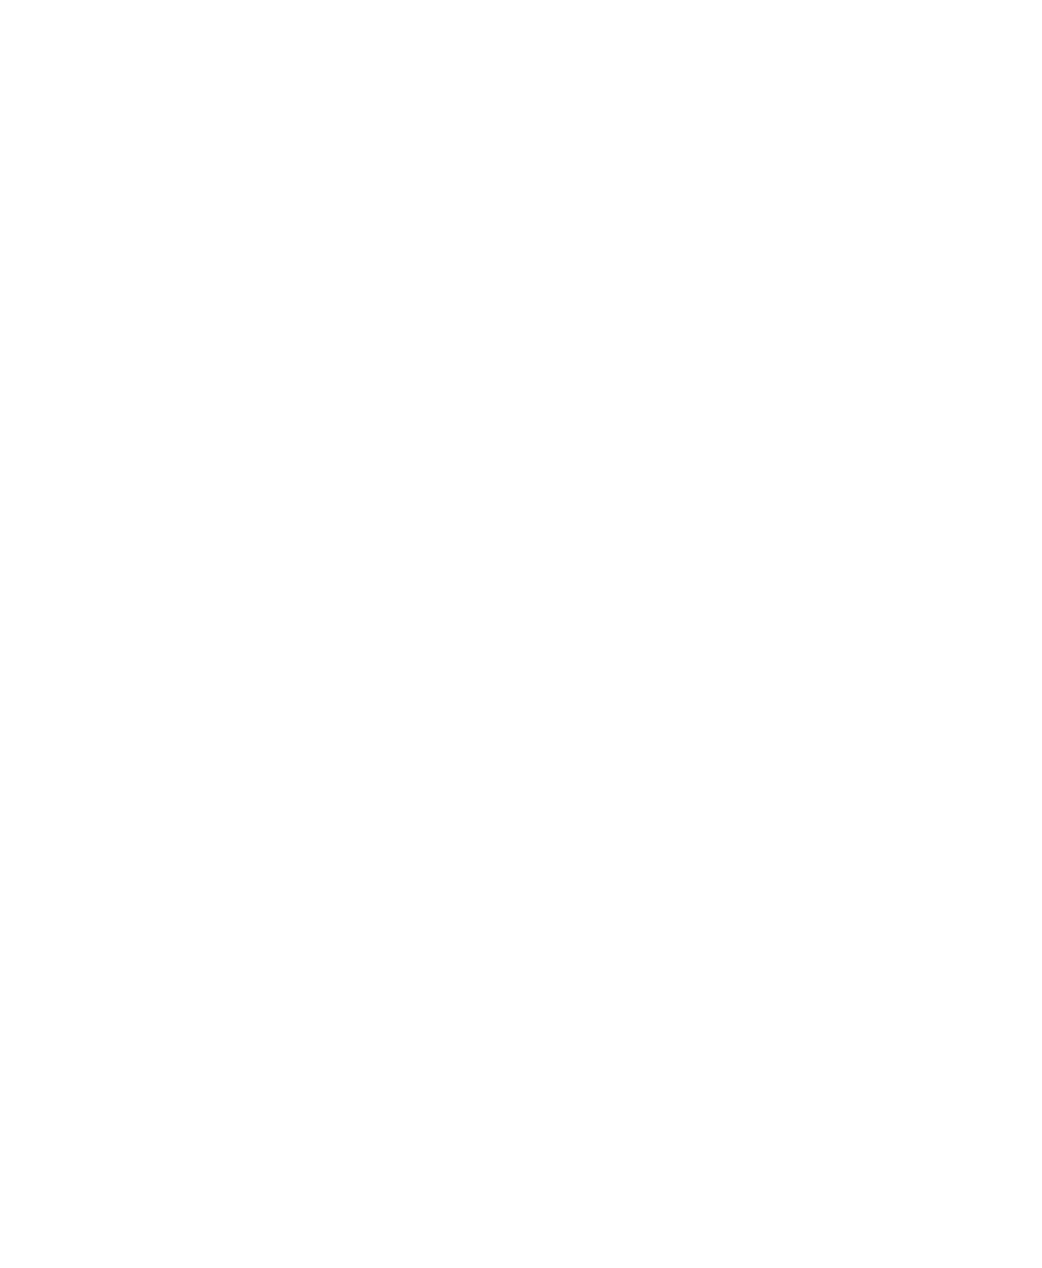 kids-RGB-01-white.png